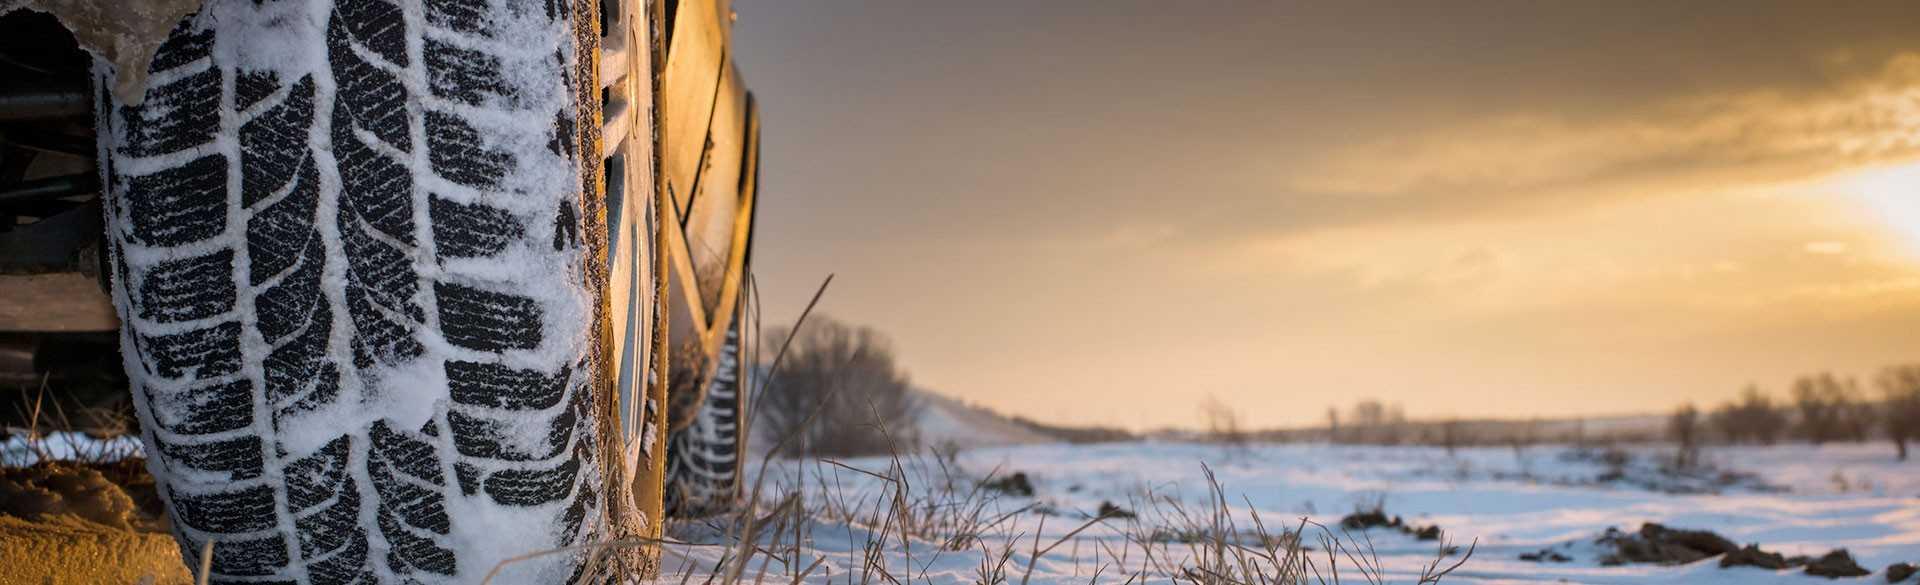 Vendita pneumatici invernali online | GommeGo